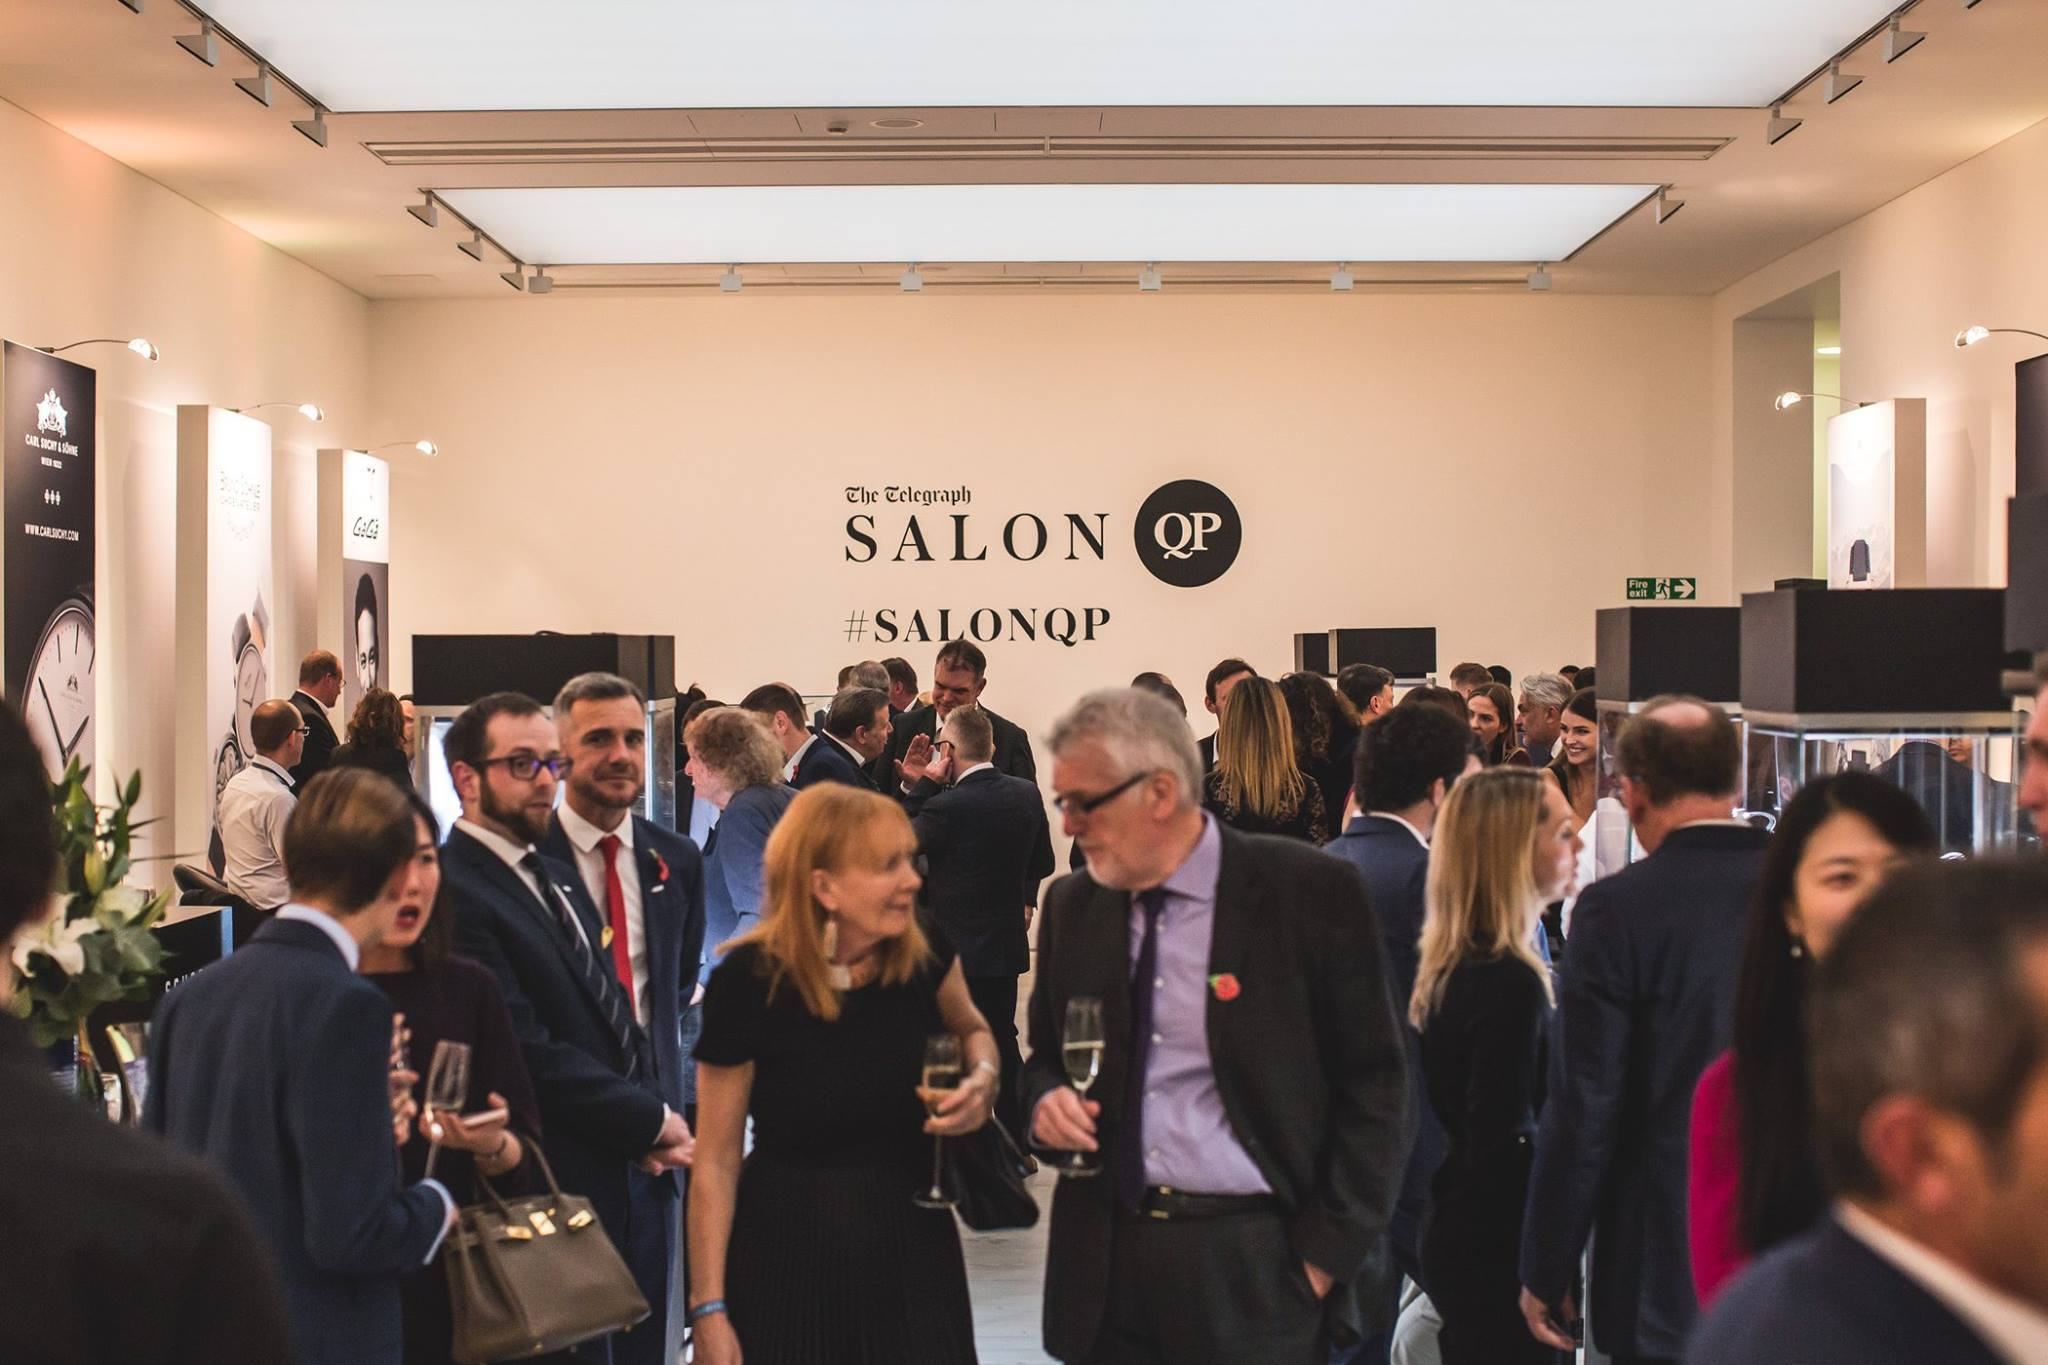 Salon QP 2017 Saatchi Gallery London - 1